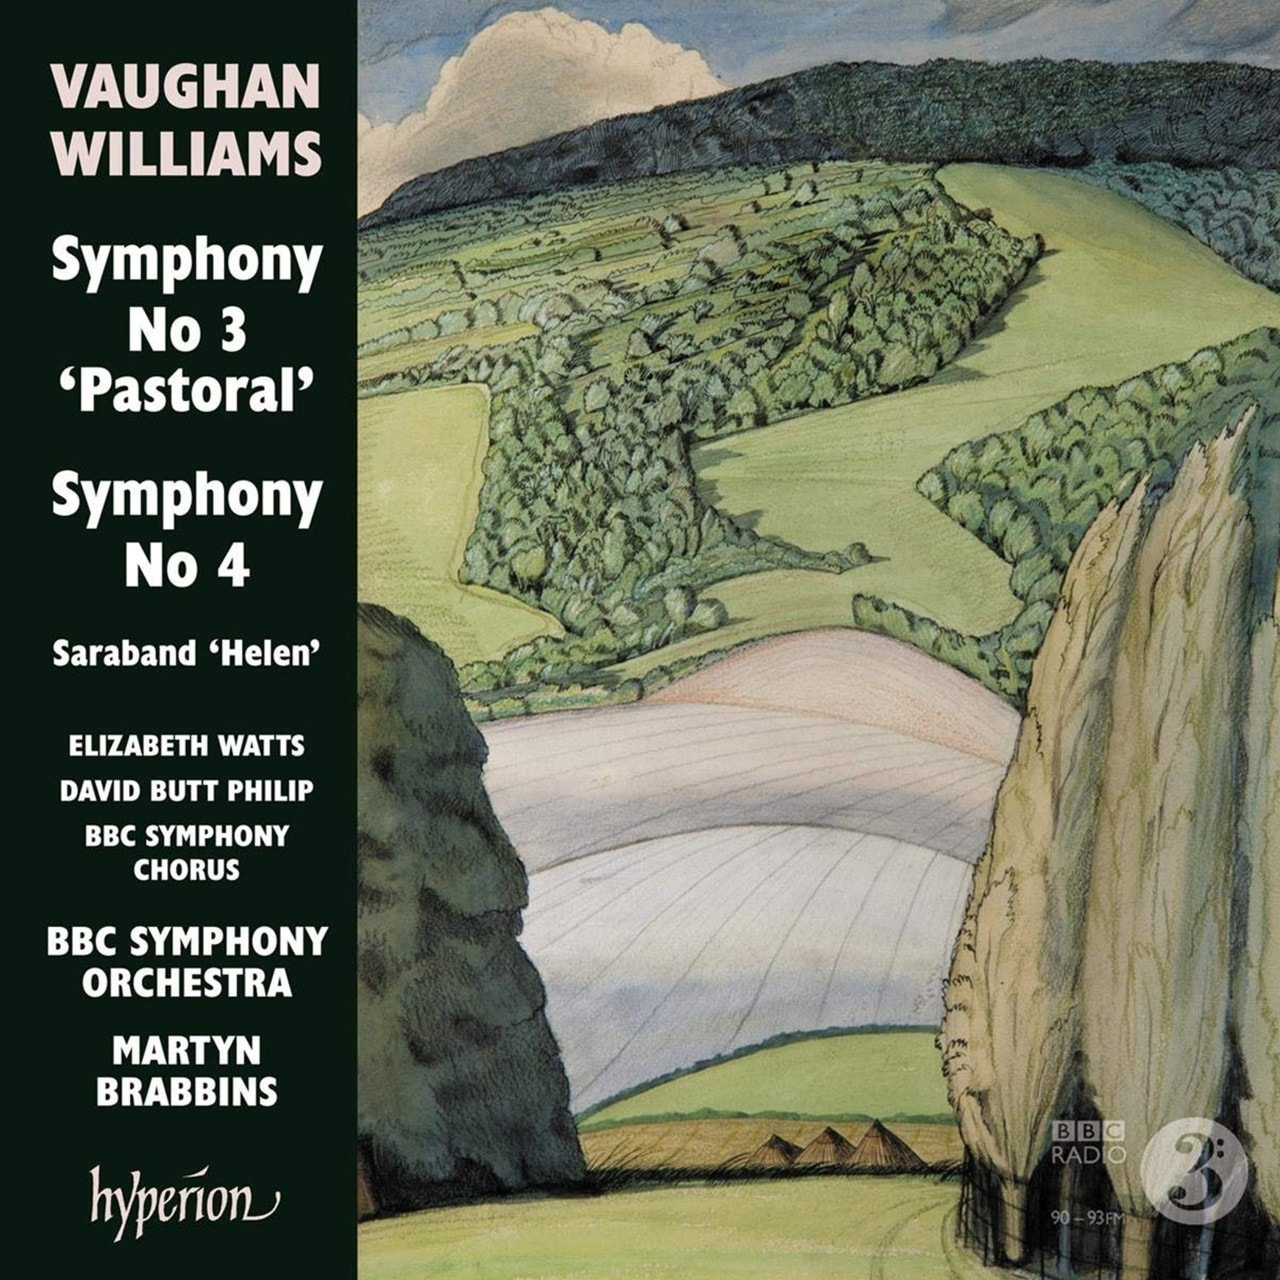 Vaughan Williams: Symphony No. 3 'Pastoral'/Symphony No. 4 - 1